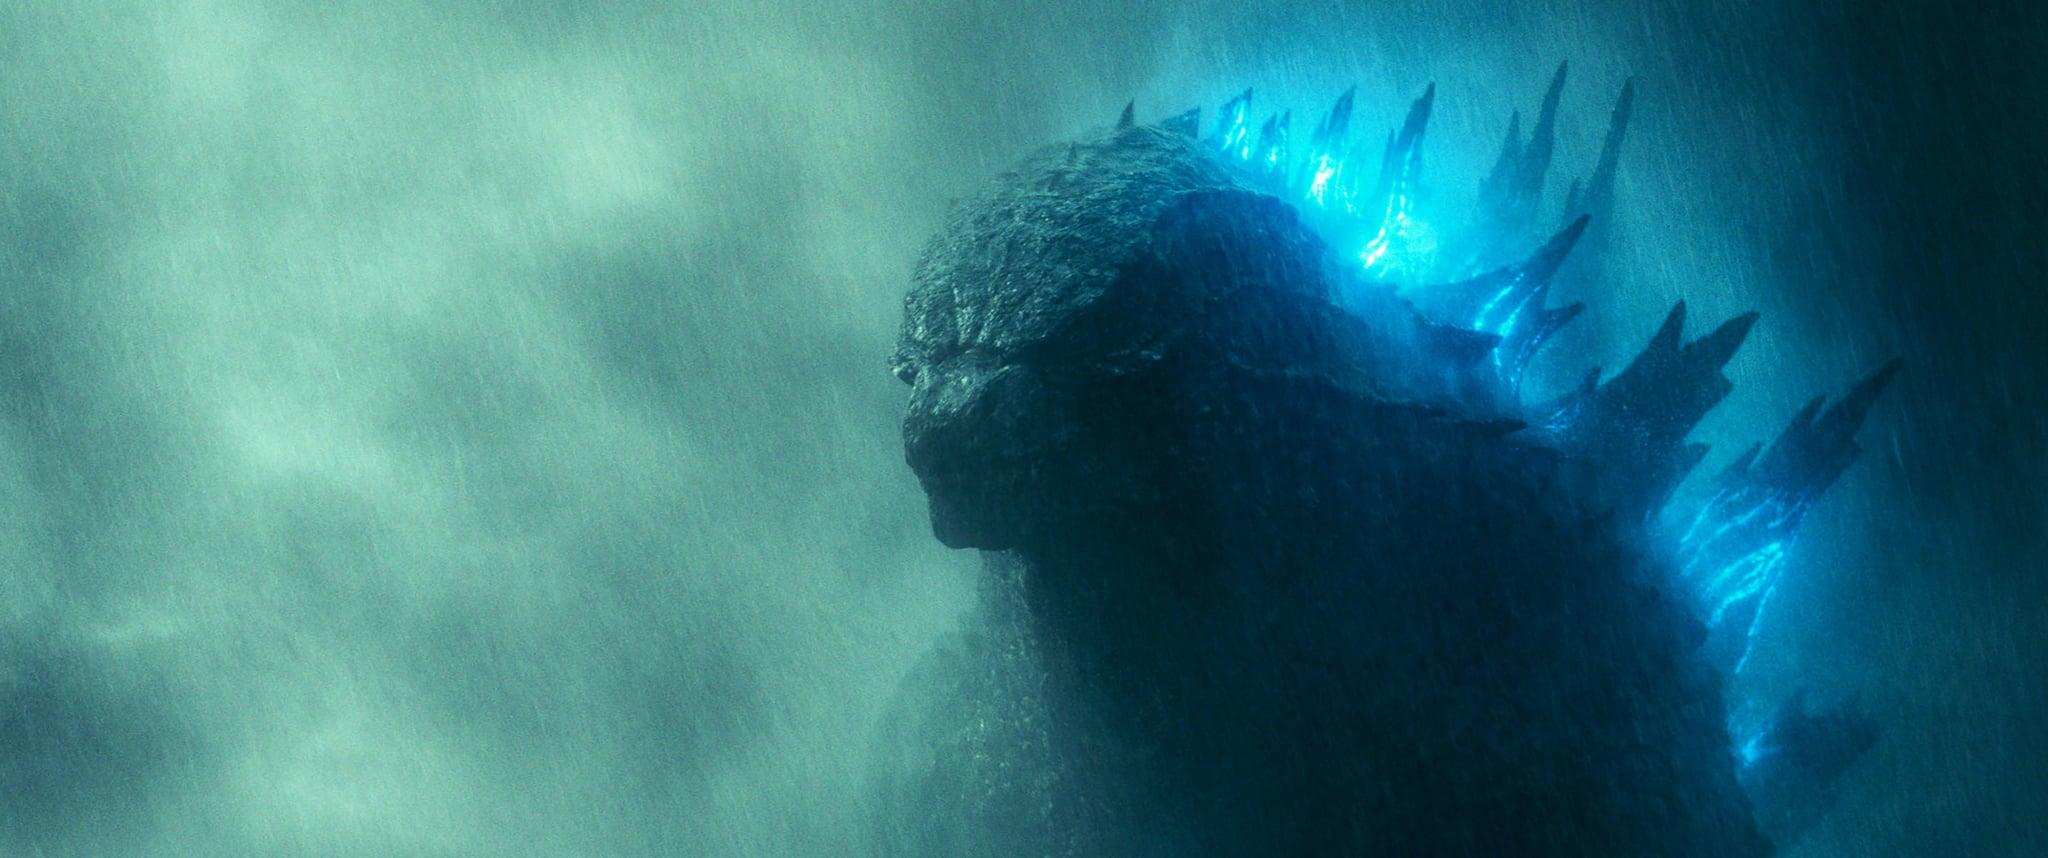 GODZILLA: KING OF THE MONSTERS, Godzilla, 2019.  Warner Bros. / courtesy Everett Collection